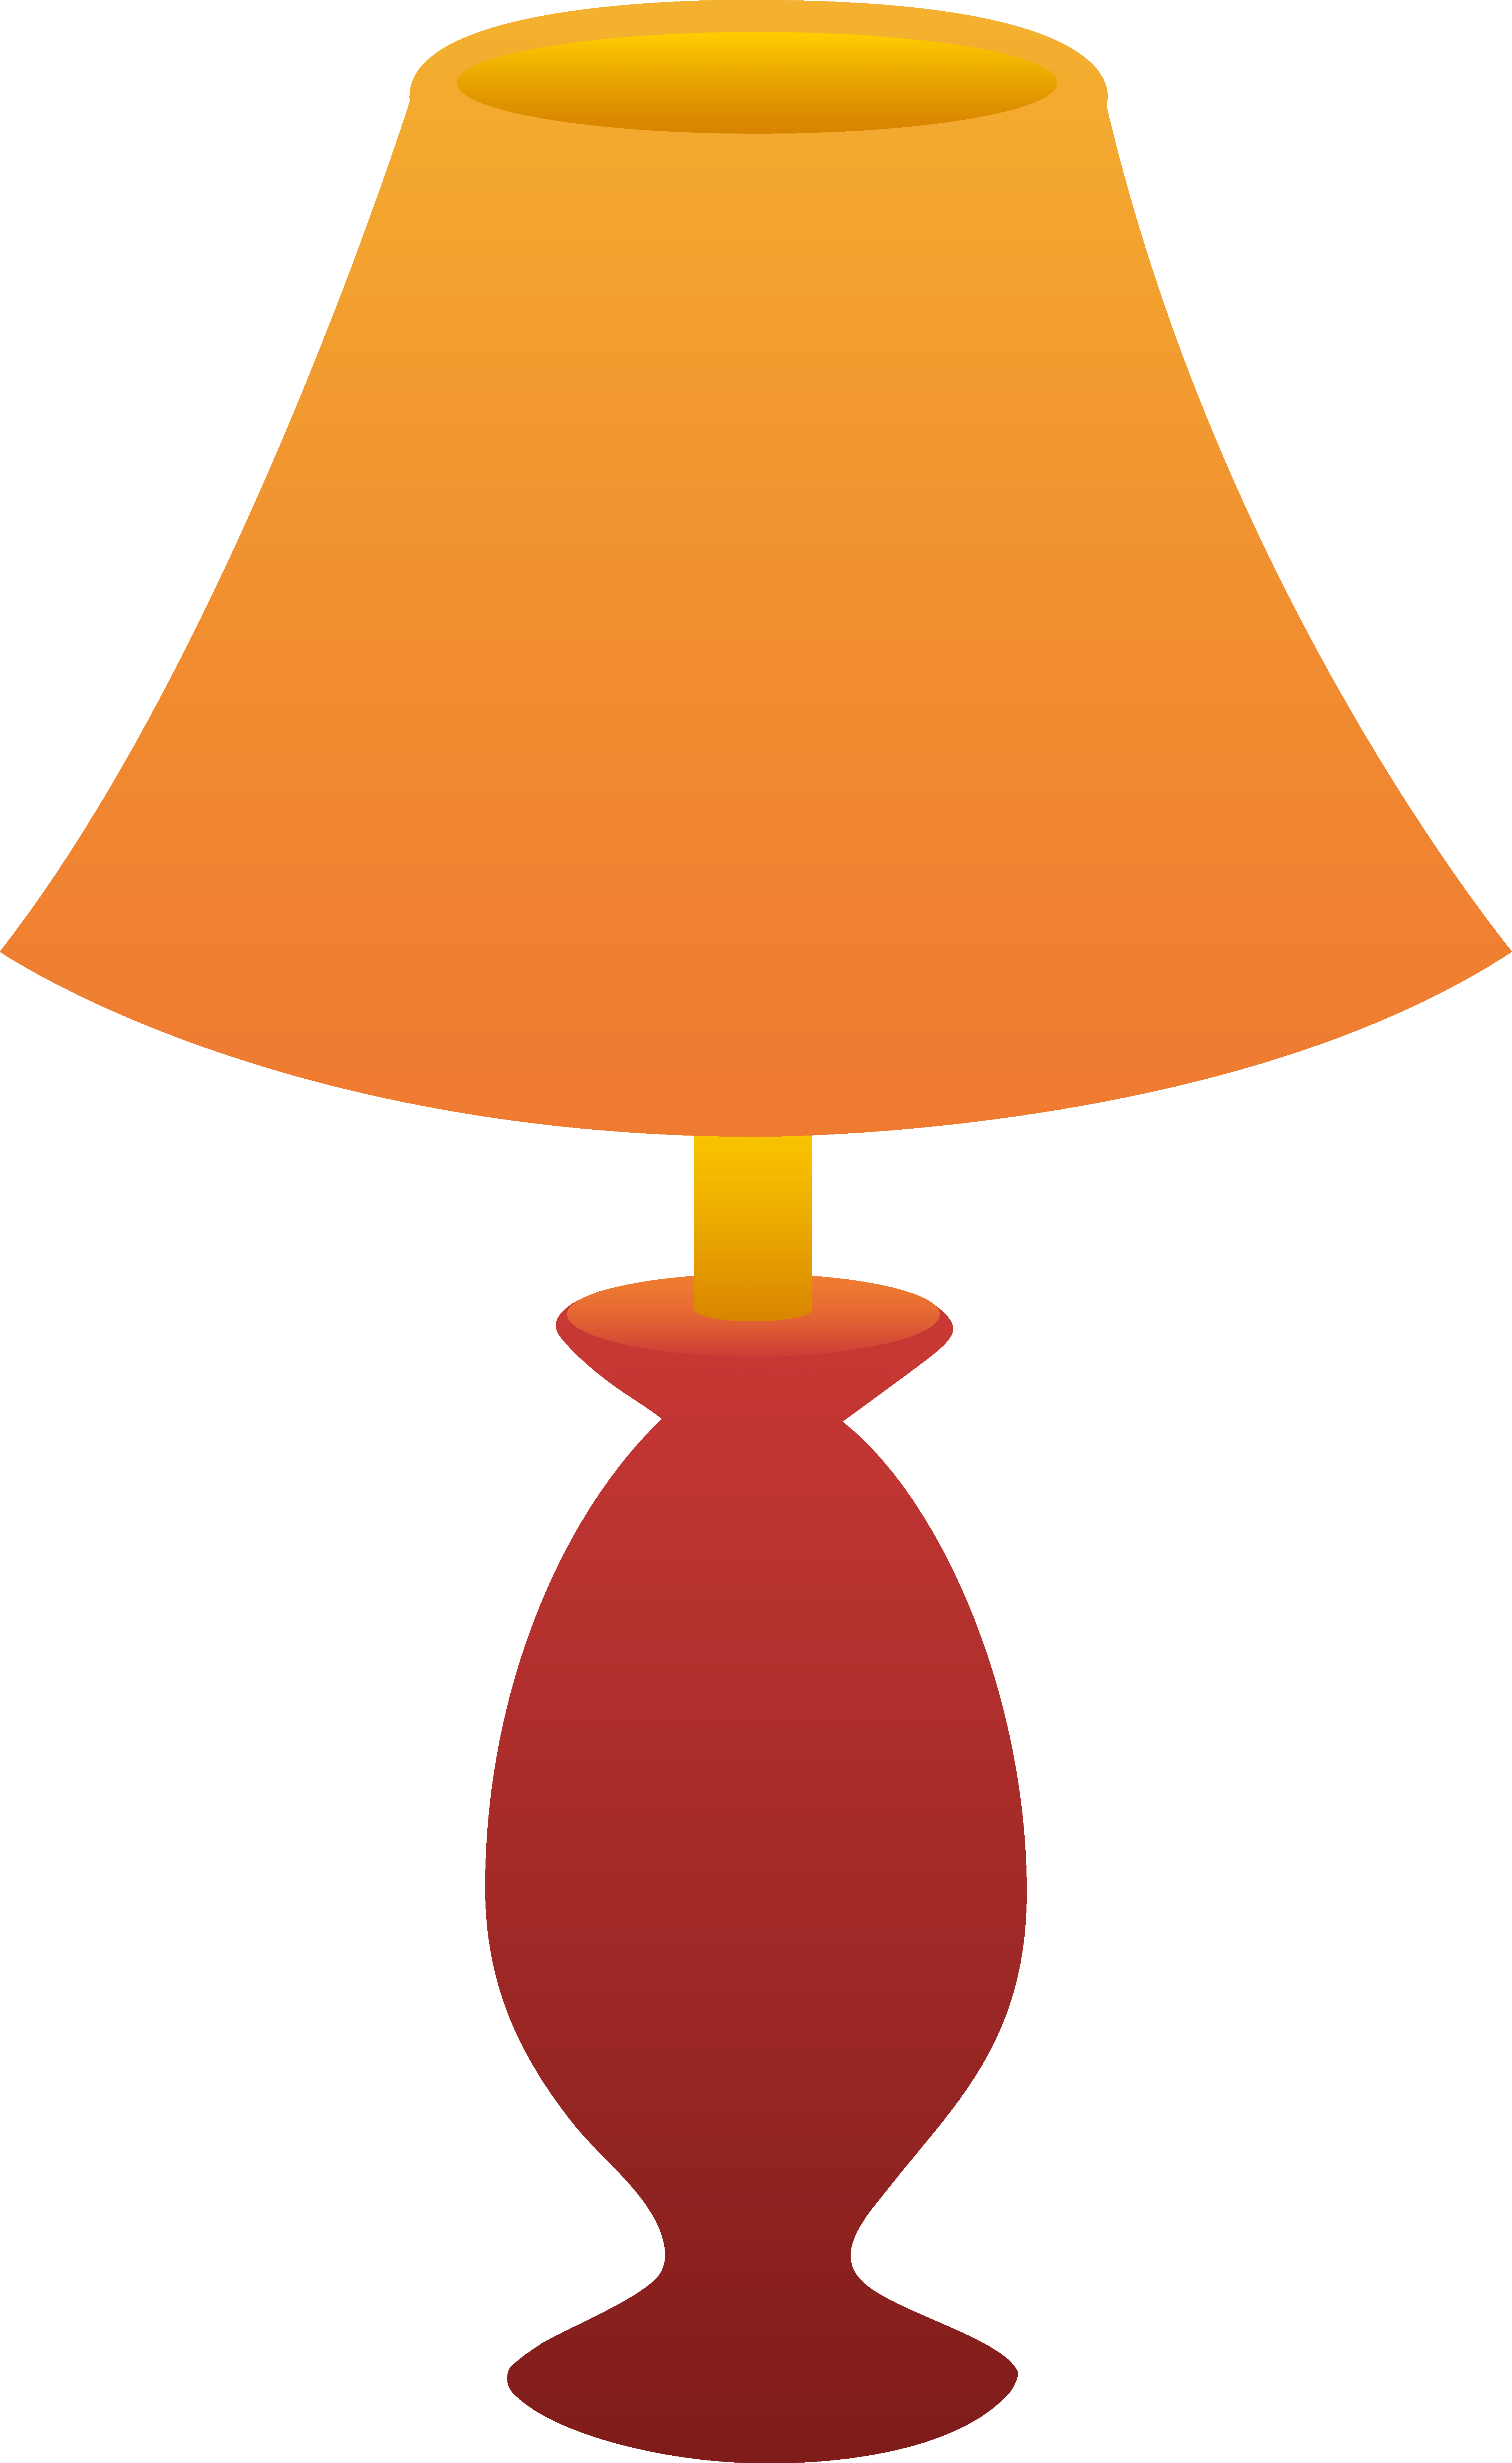 Lamp clipart bed lamp. Photo car essay saveenlarge